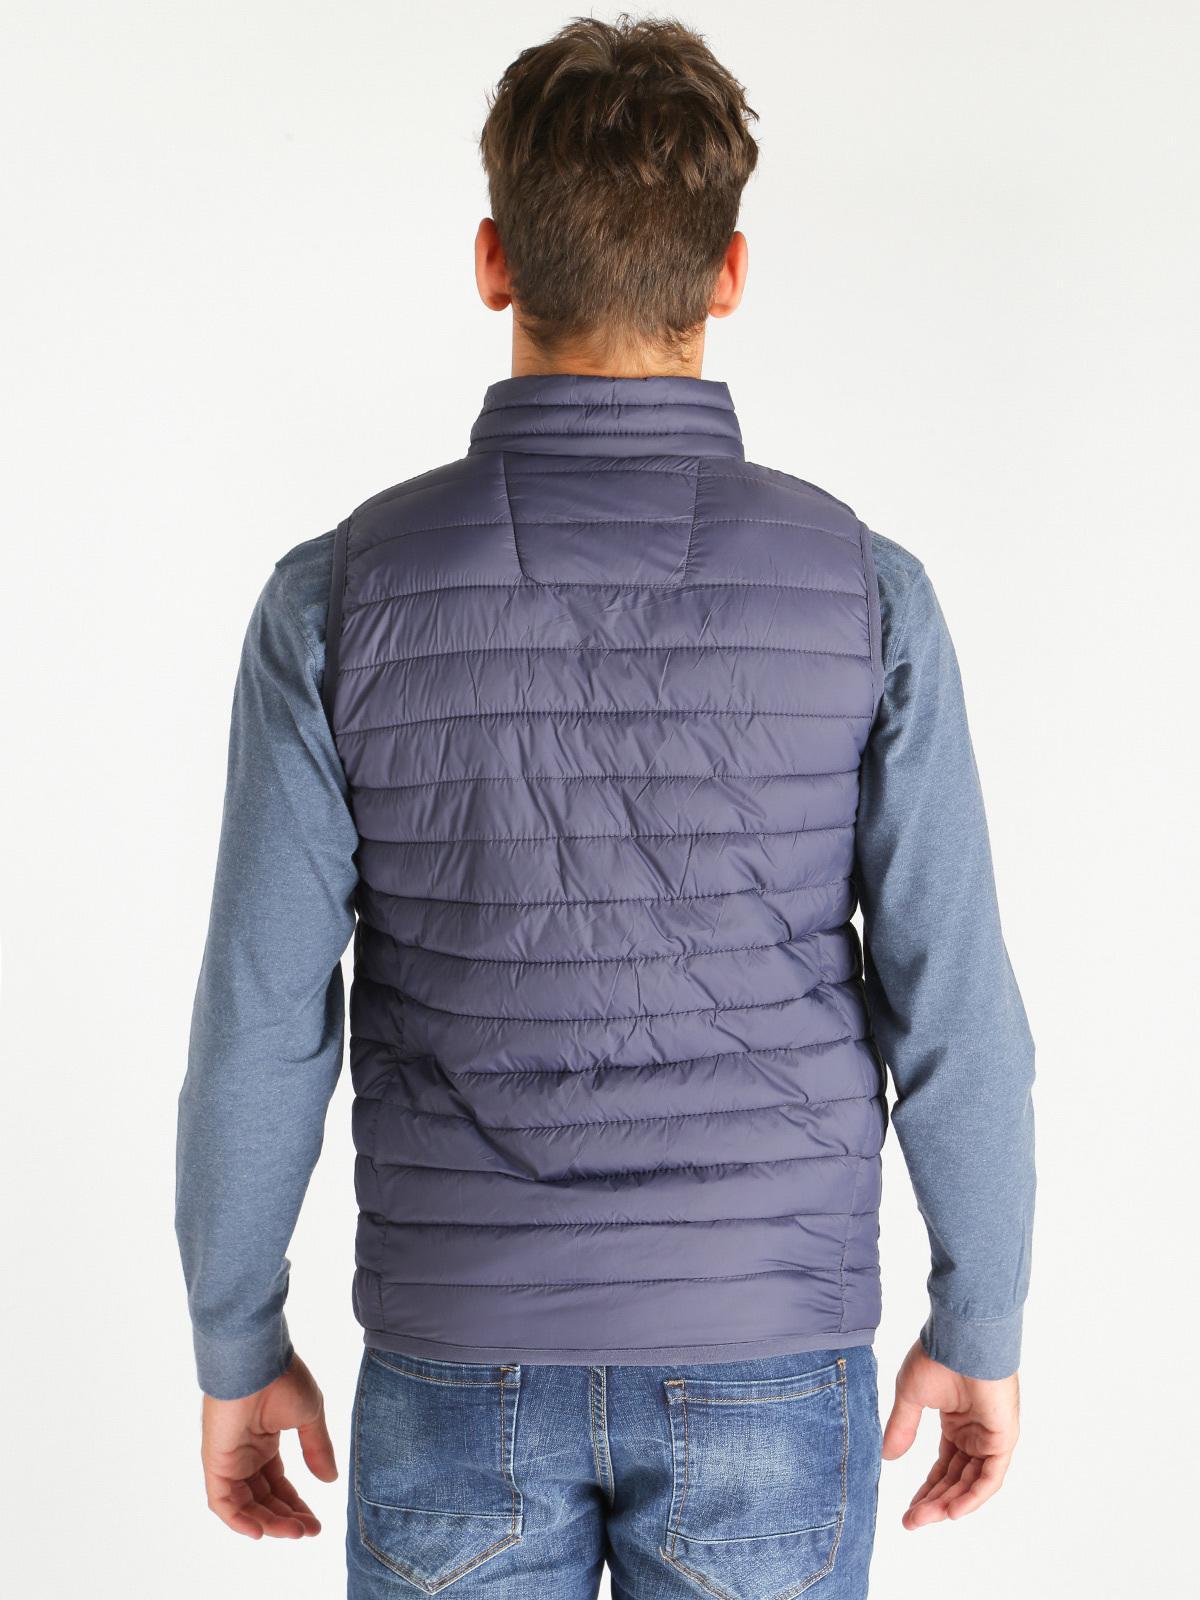 new product 0803b ed923 Giubbino smanicato - blu coveri collection | MecShopping